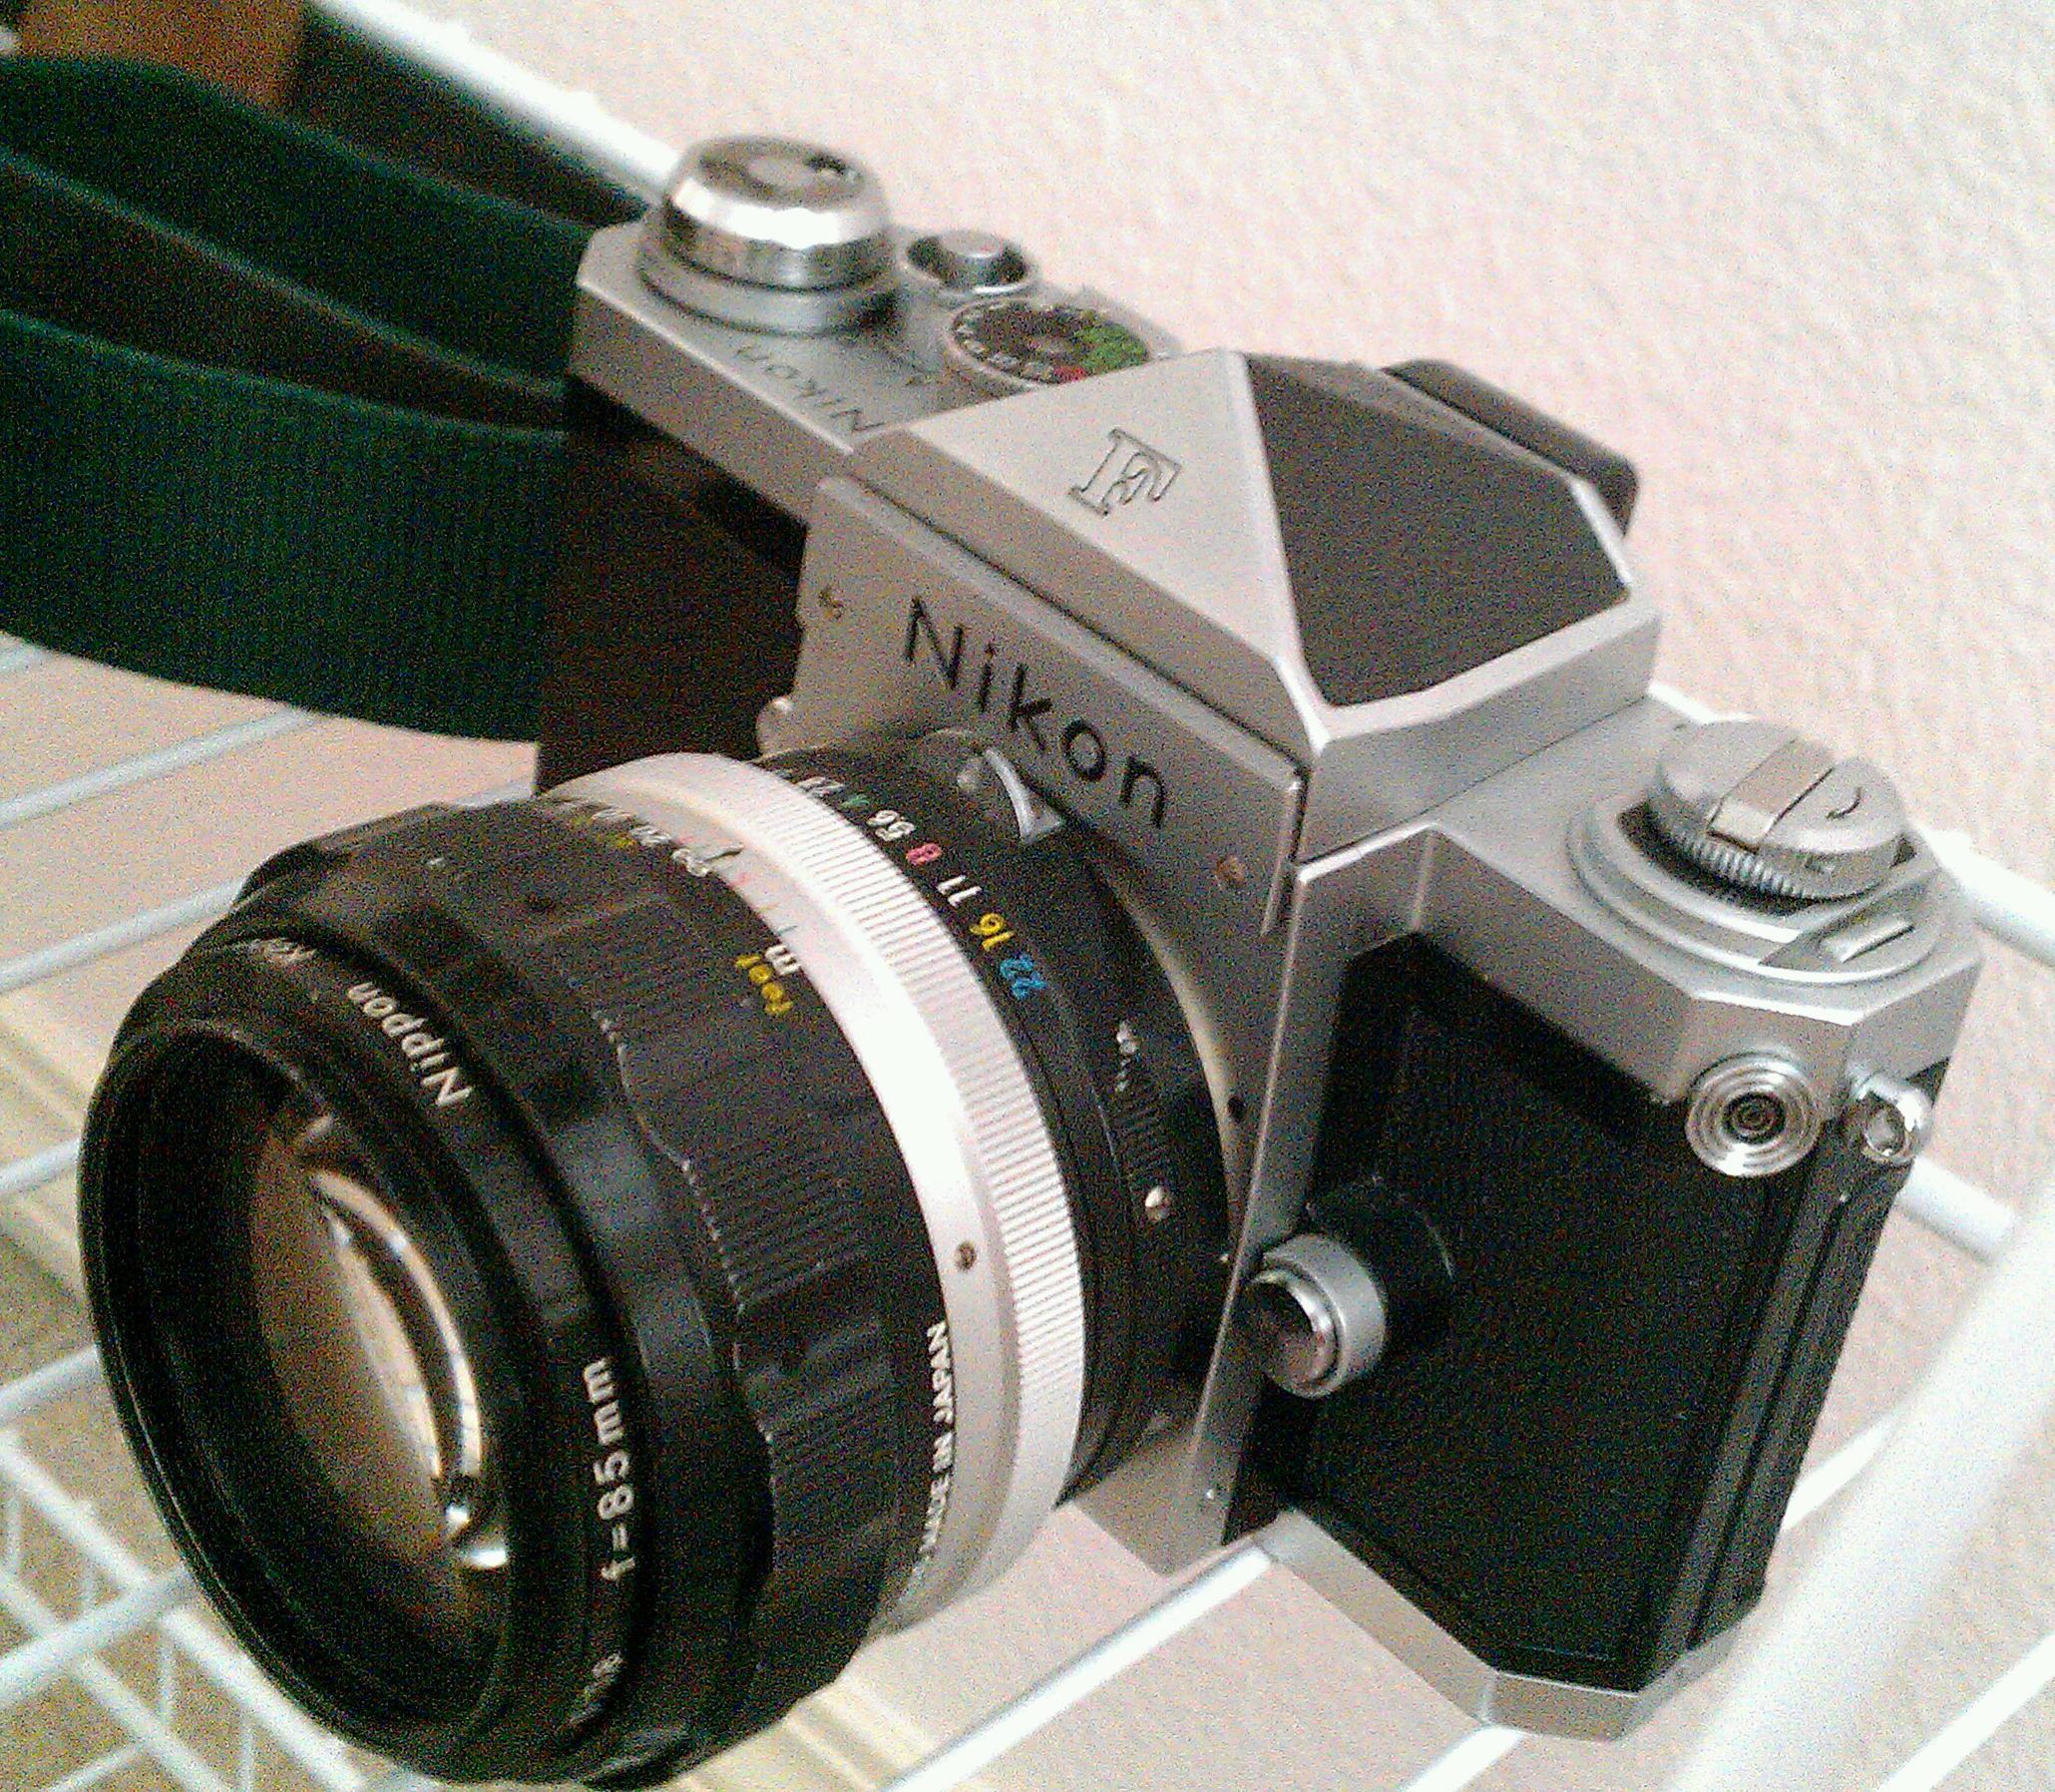 IMAG4501-1.jpg